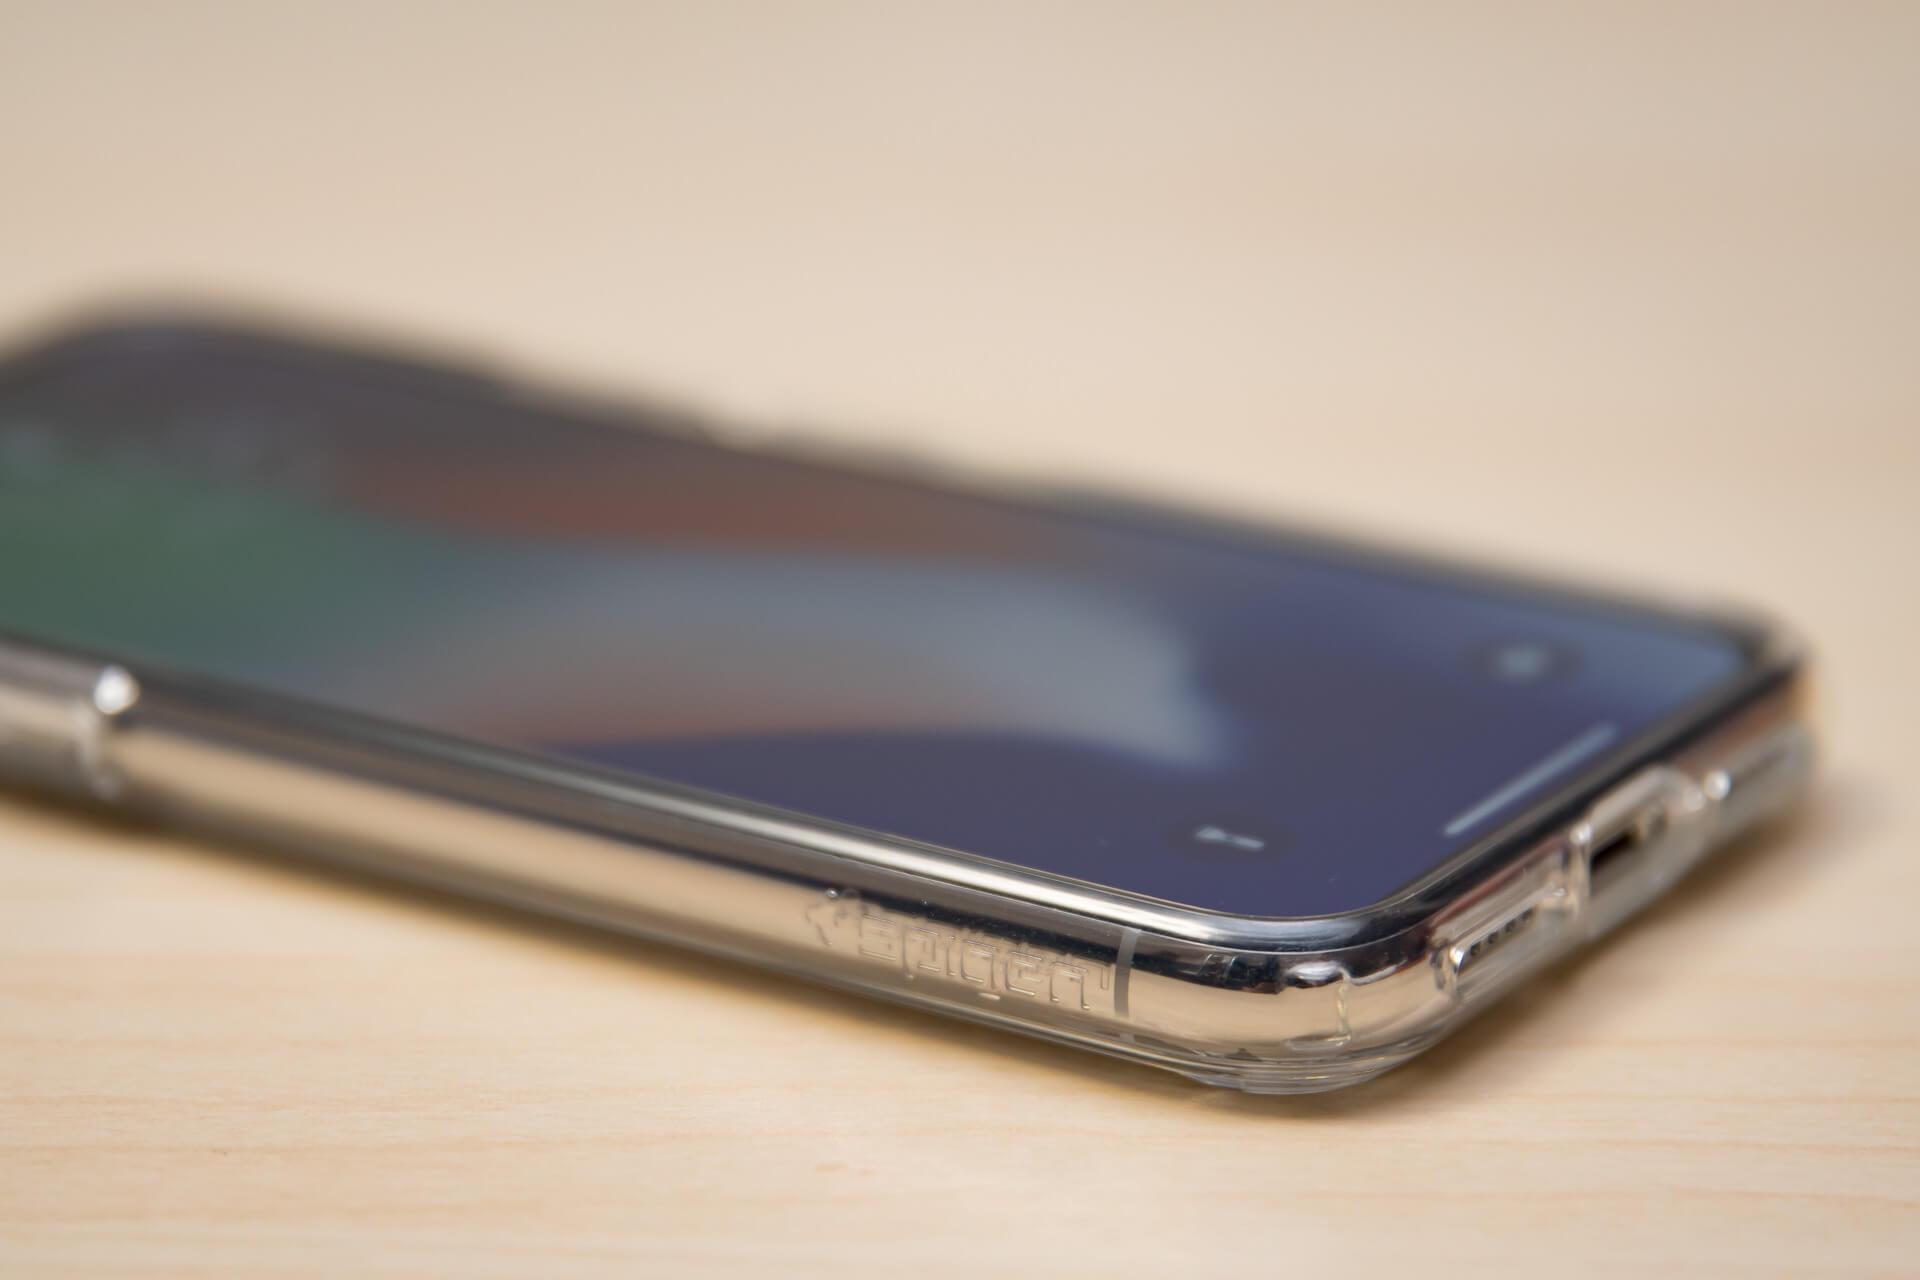 Spigen iPhone X ケース ウルトラ・ハイブリッド 10